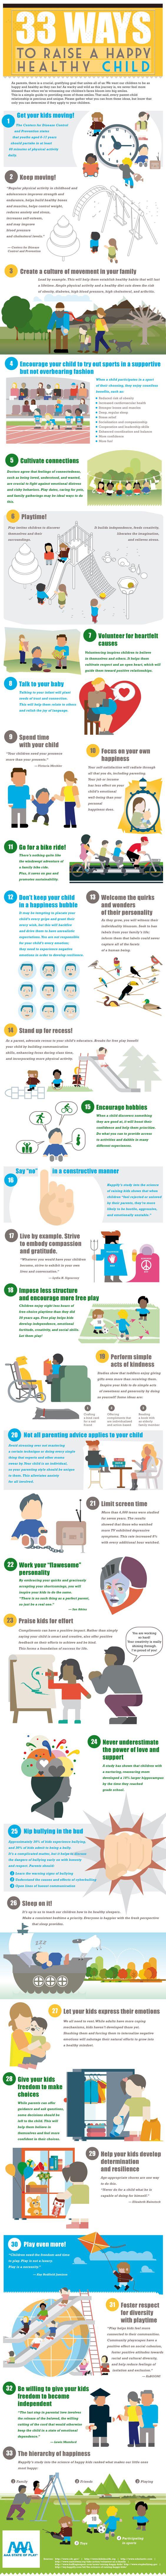 33 Ways to Raise a Happy Health Child - AAAStateofPlay.com - Infographic